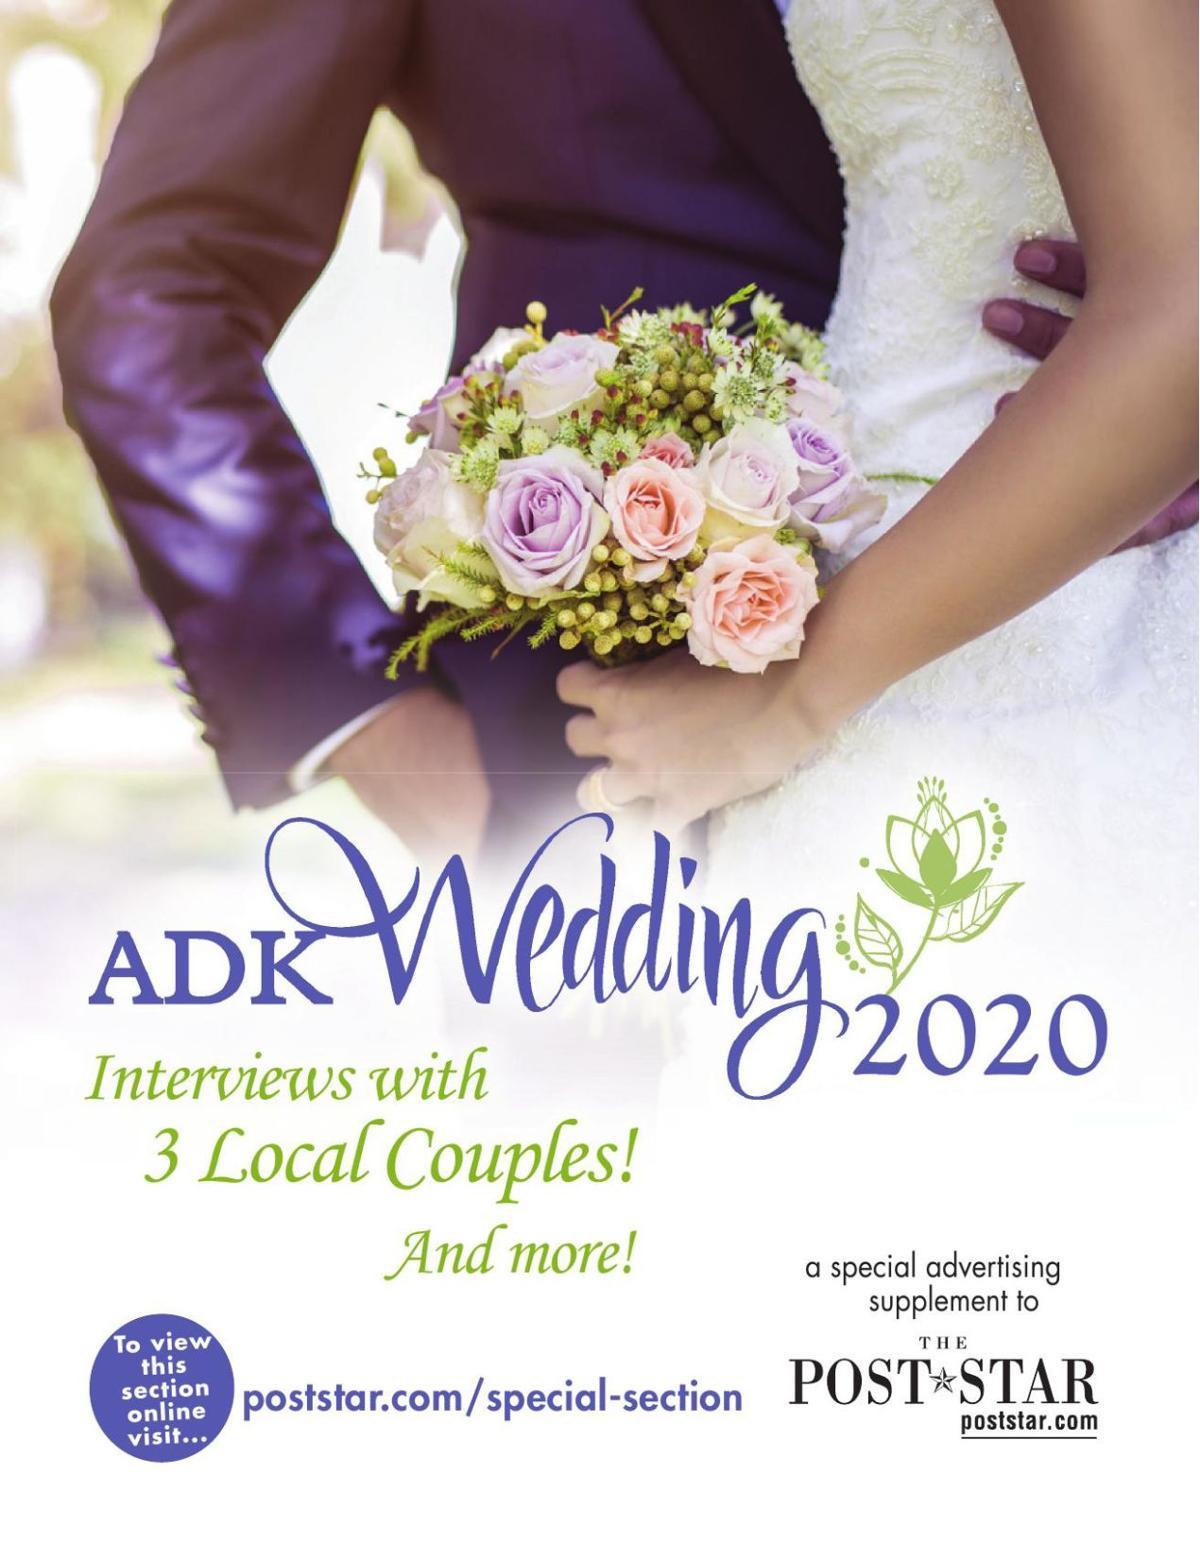 ADK Wedding 1.24.2020